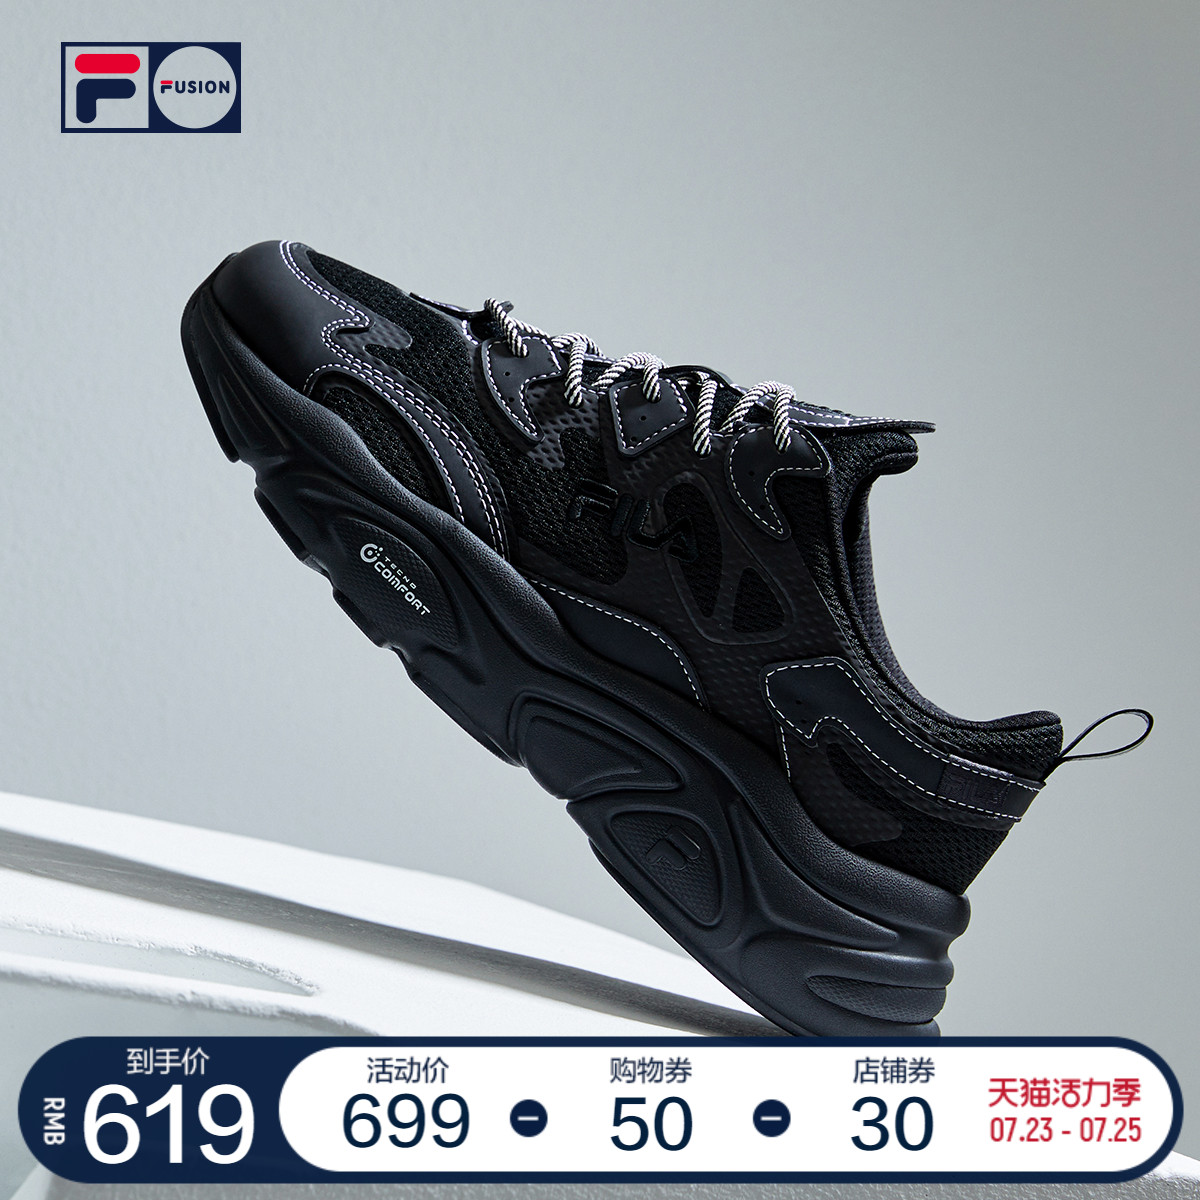 FILA FUSION斐乐潮牌跑步鞋老爹鞋女2021夏季Kōki,同款火星鞋女